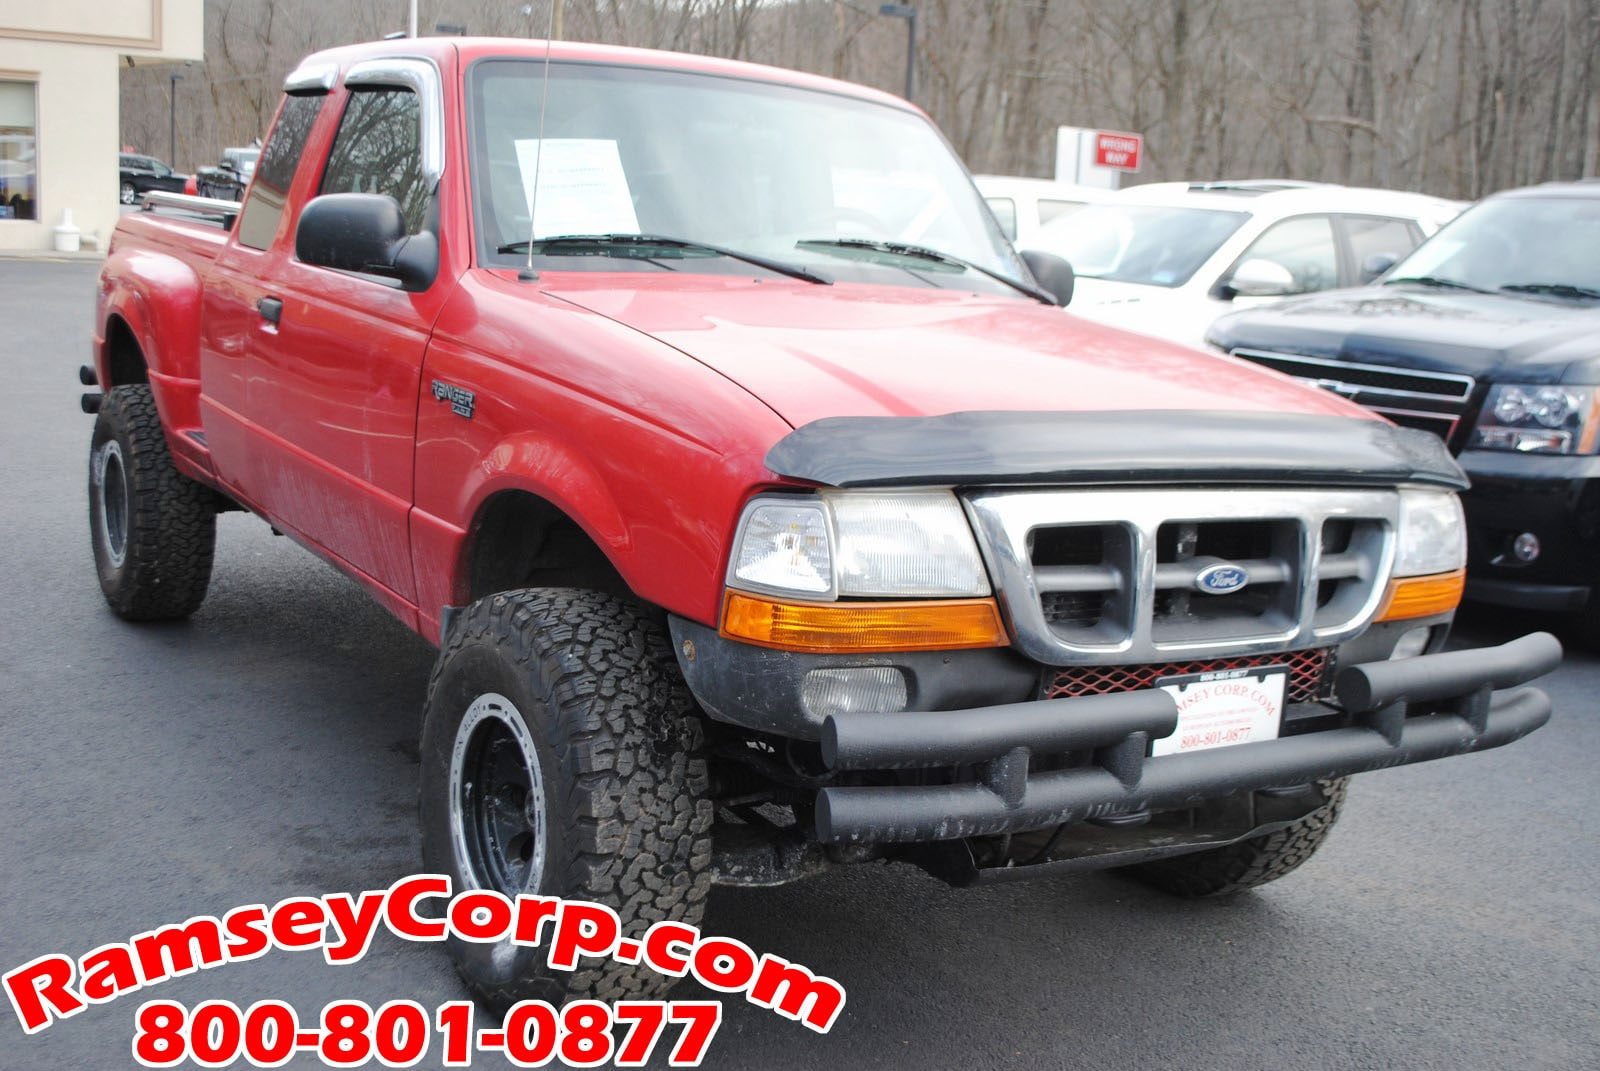 2000 ford ranger xlt 30 truck super cab - 2000 Ford Ranger Extended Cab For Sale